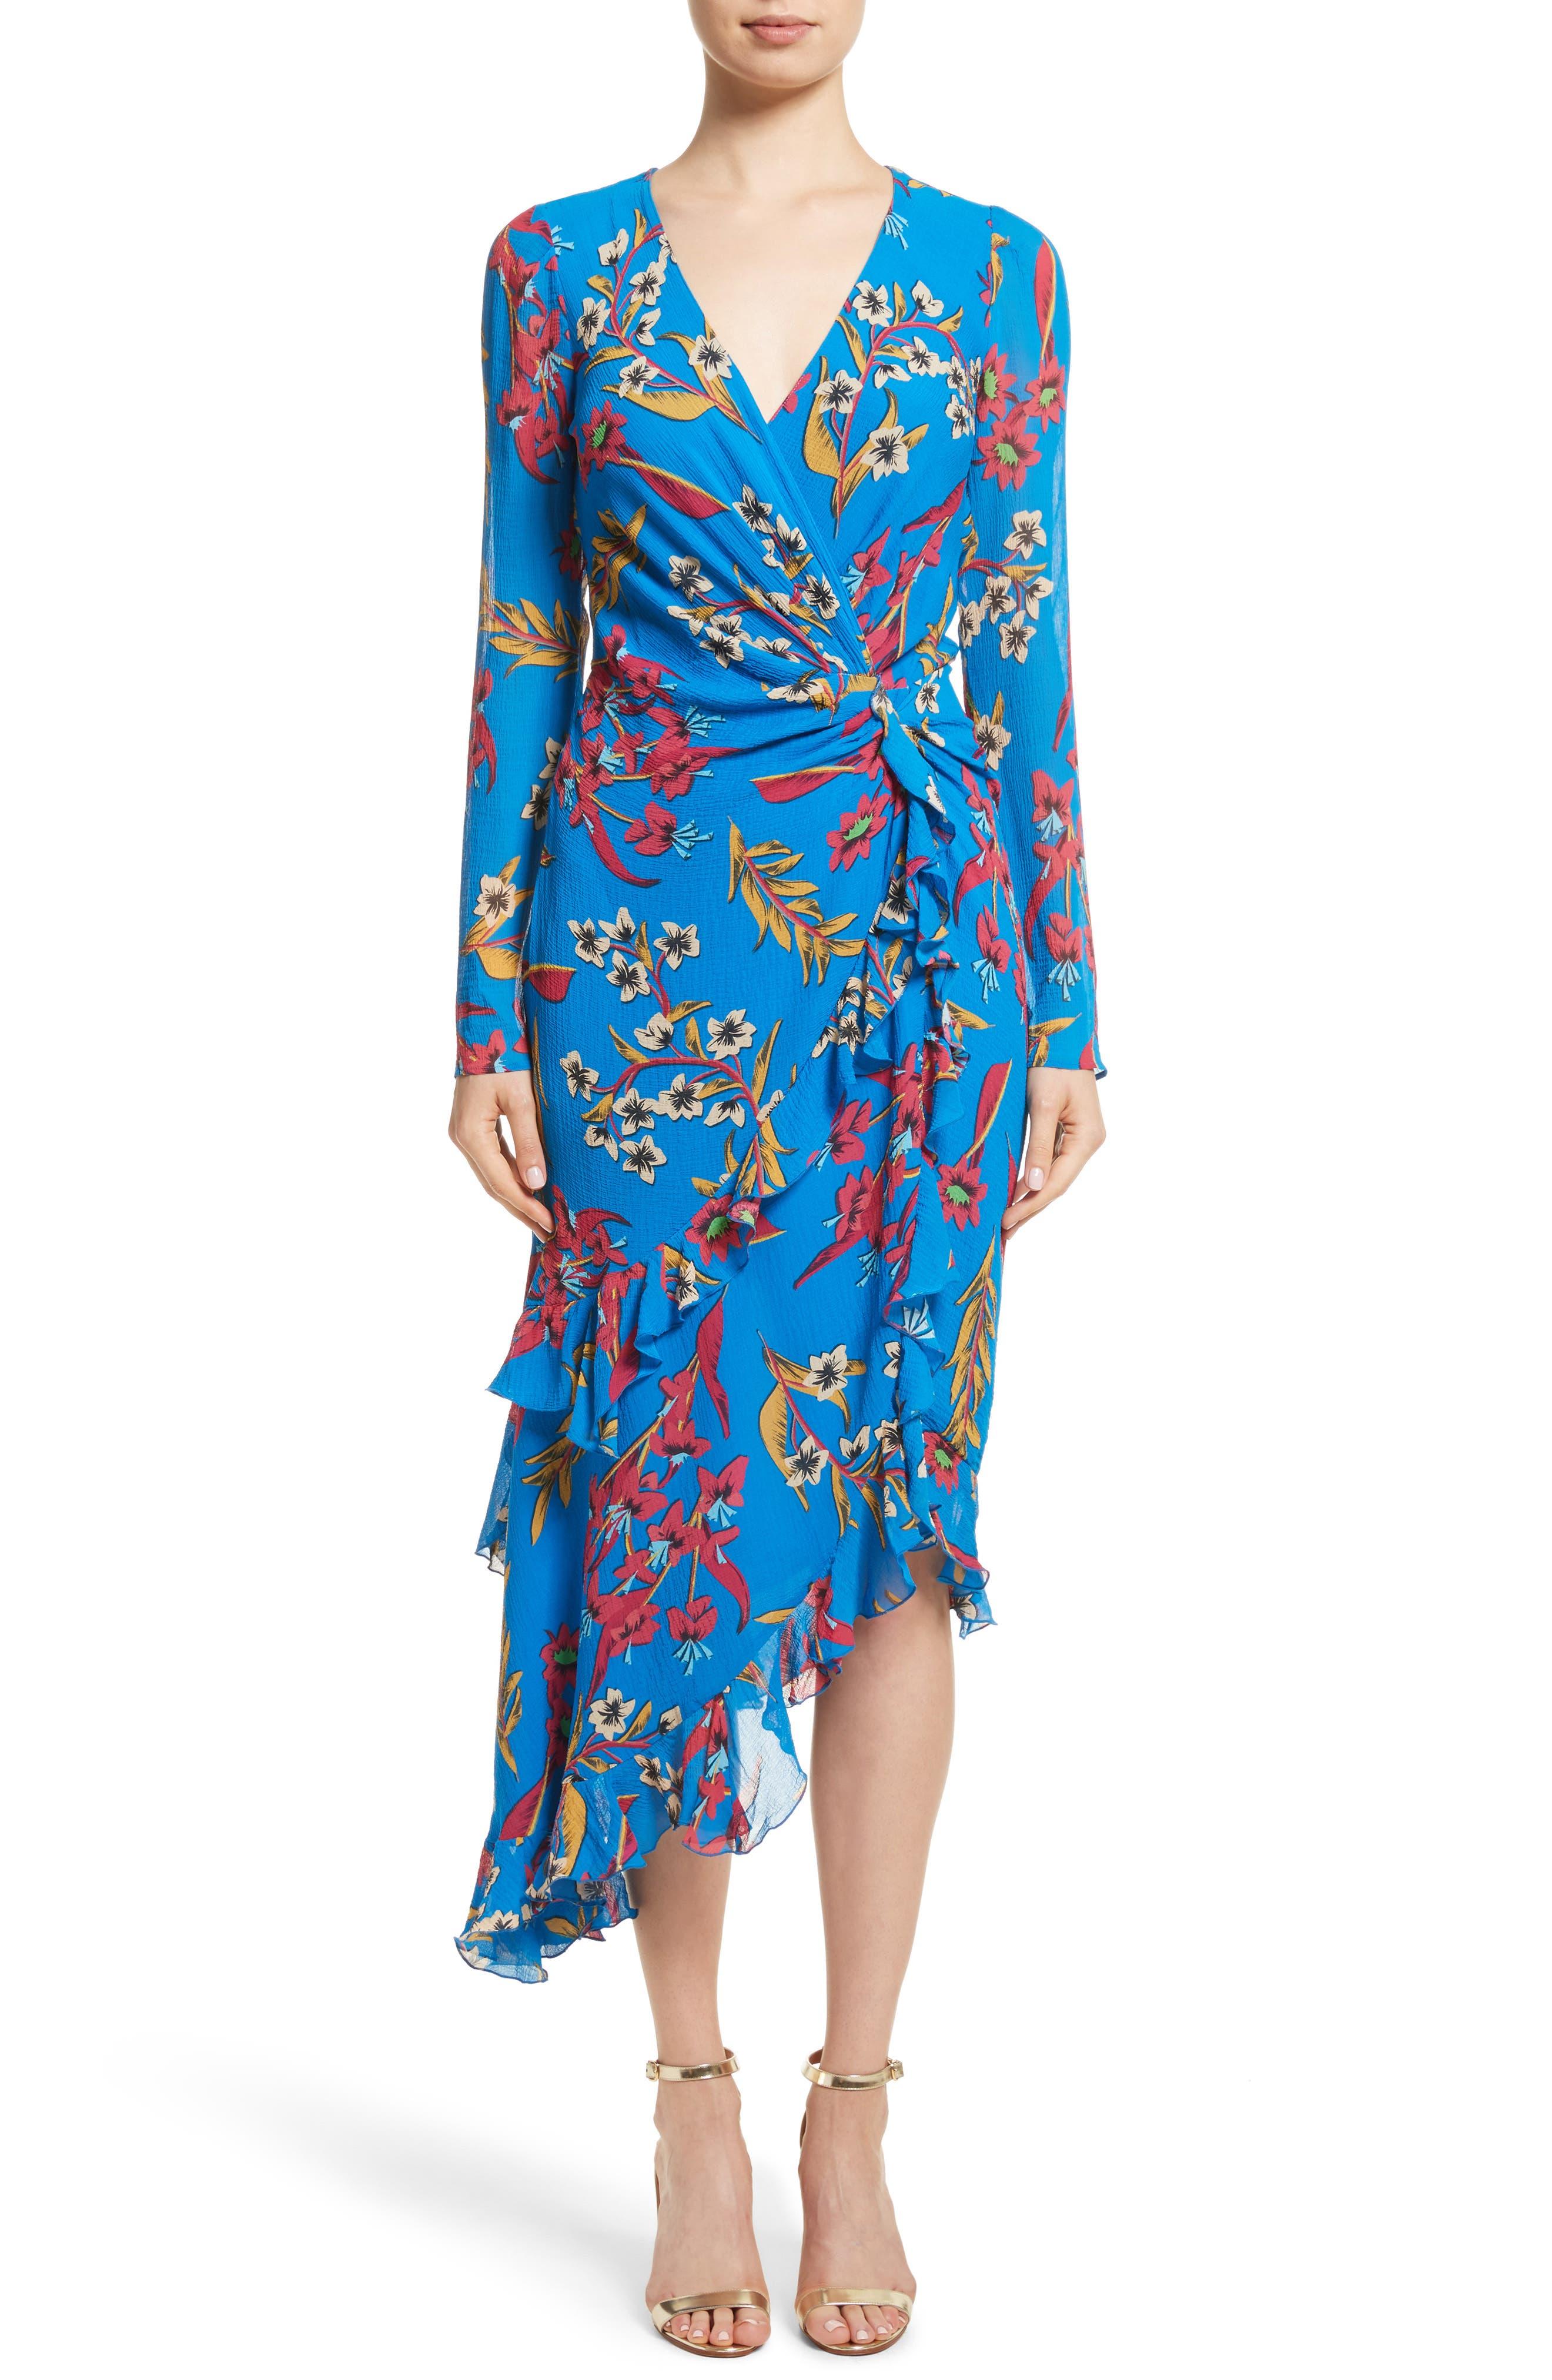 Jungle Floral Print Asymmetrical Ruffle Dress,                             Main thumbnail 1, color,                             410